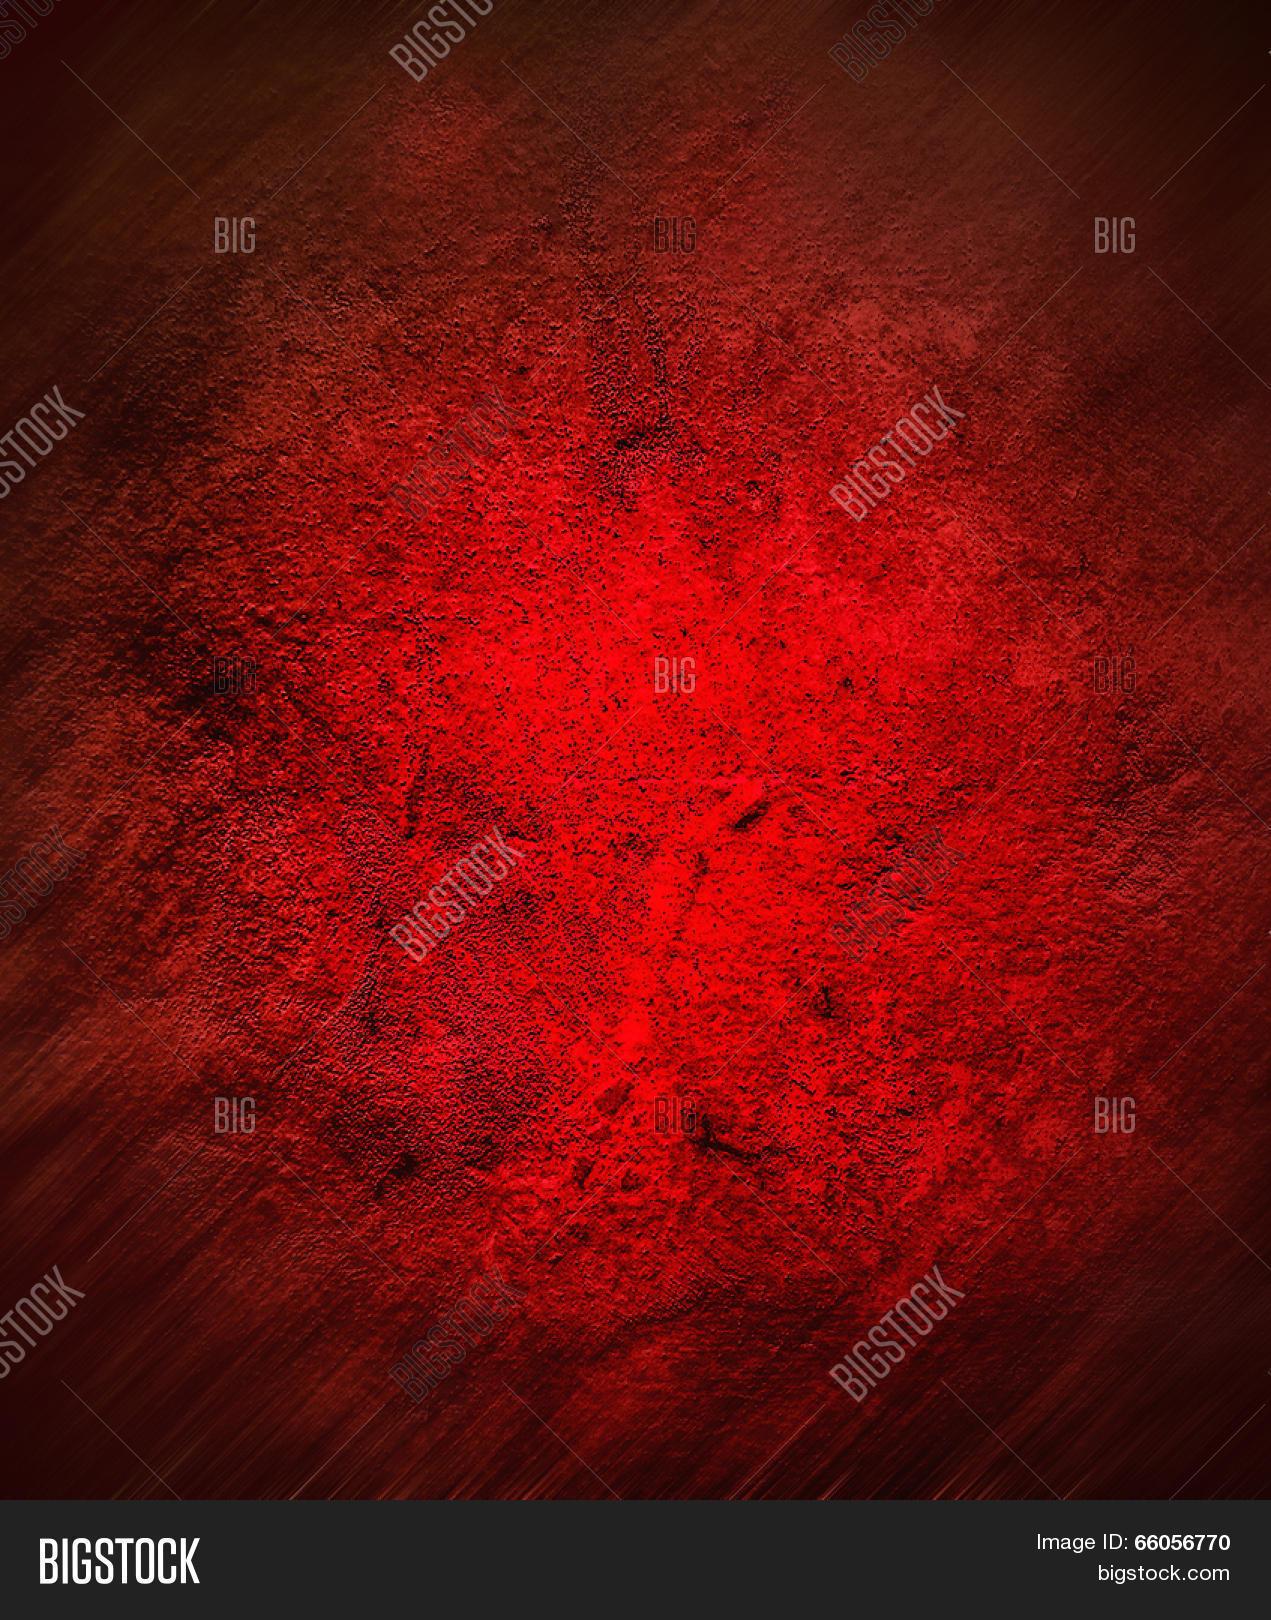 Abstract Vibrant Art Background Image Photo Bigstock